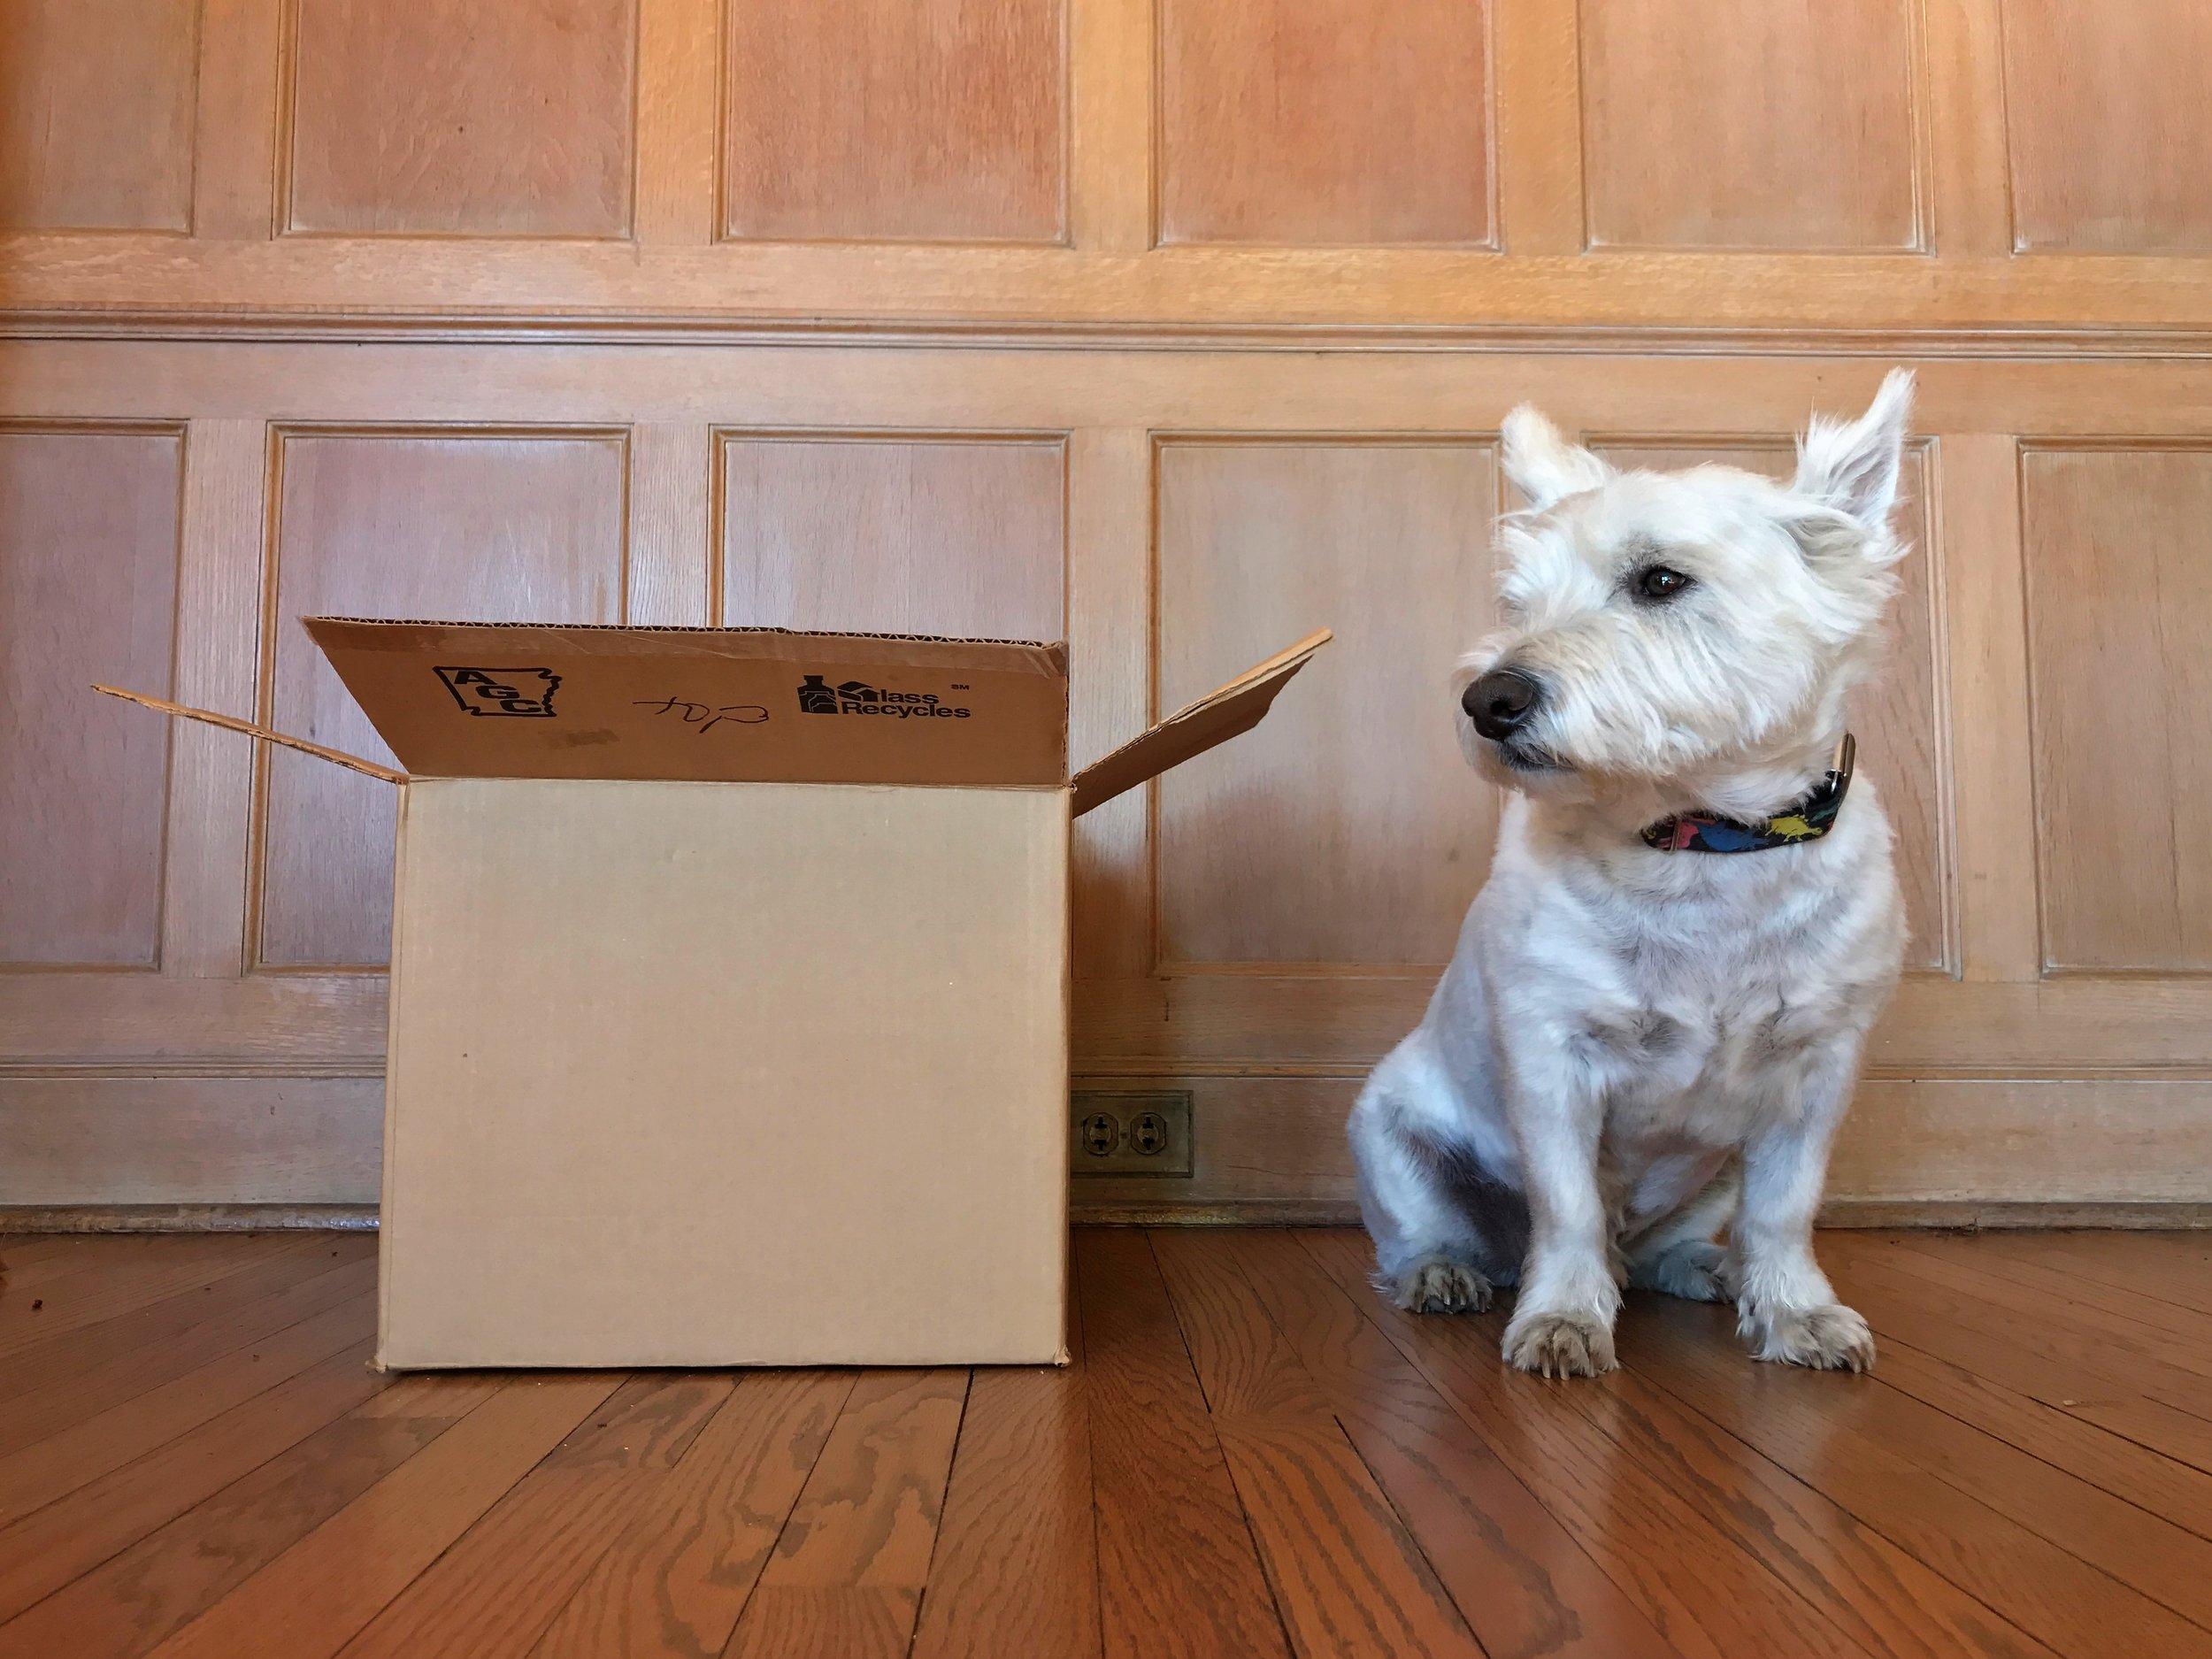 Chauncey contemplates the purpose of a box.